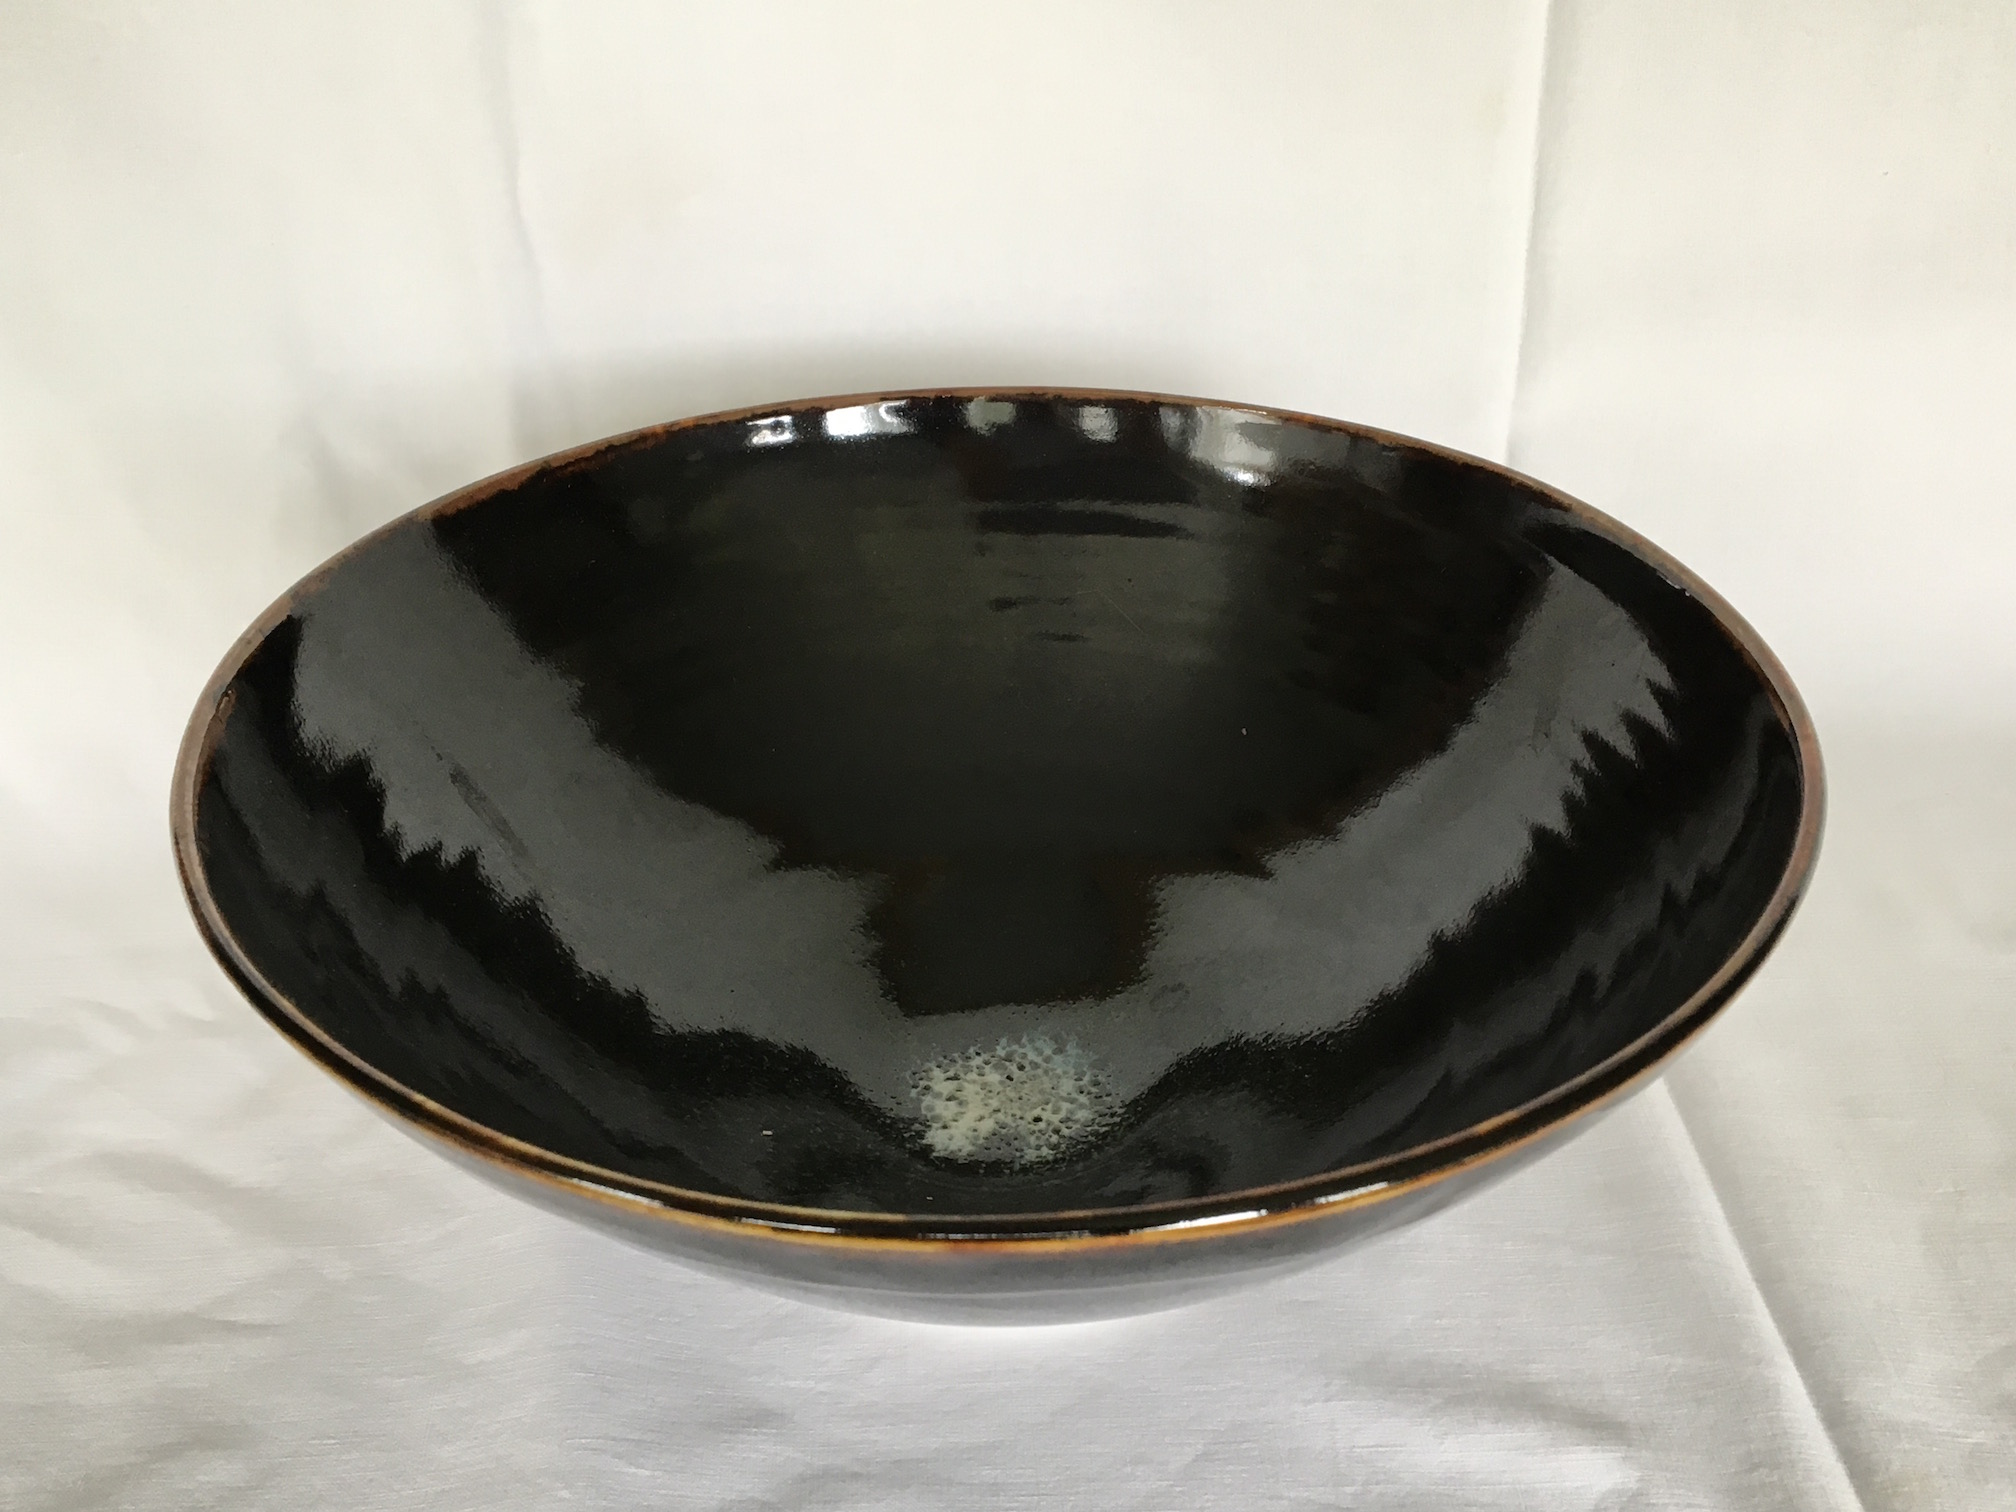 lge bowl tenoakjpg